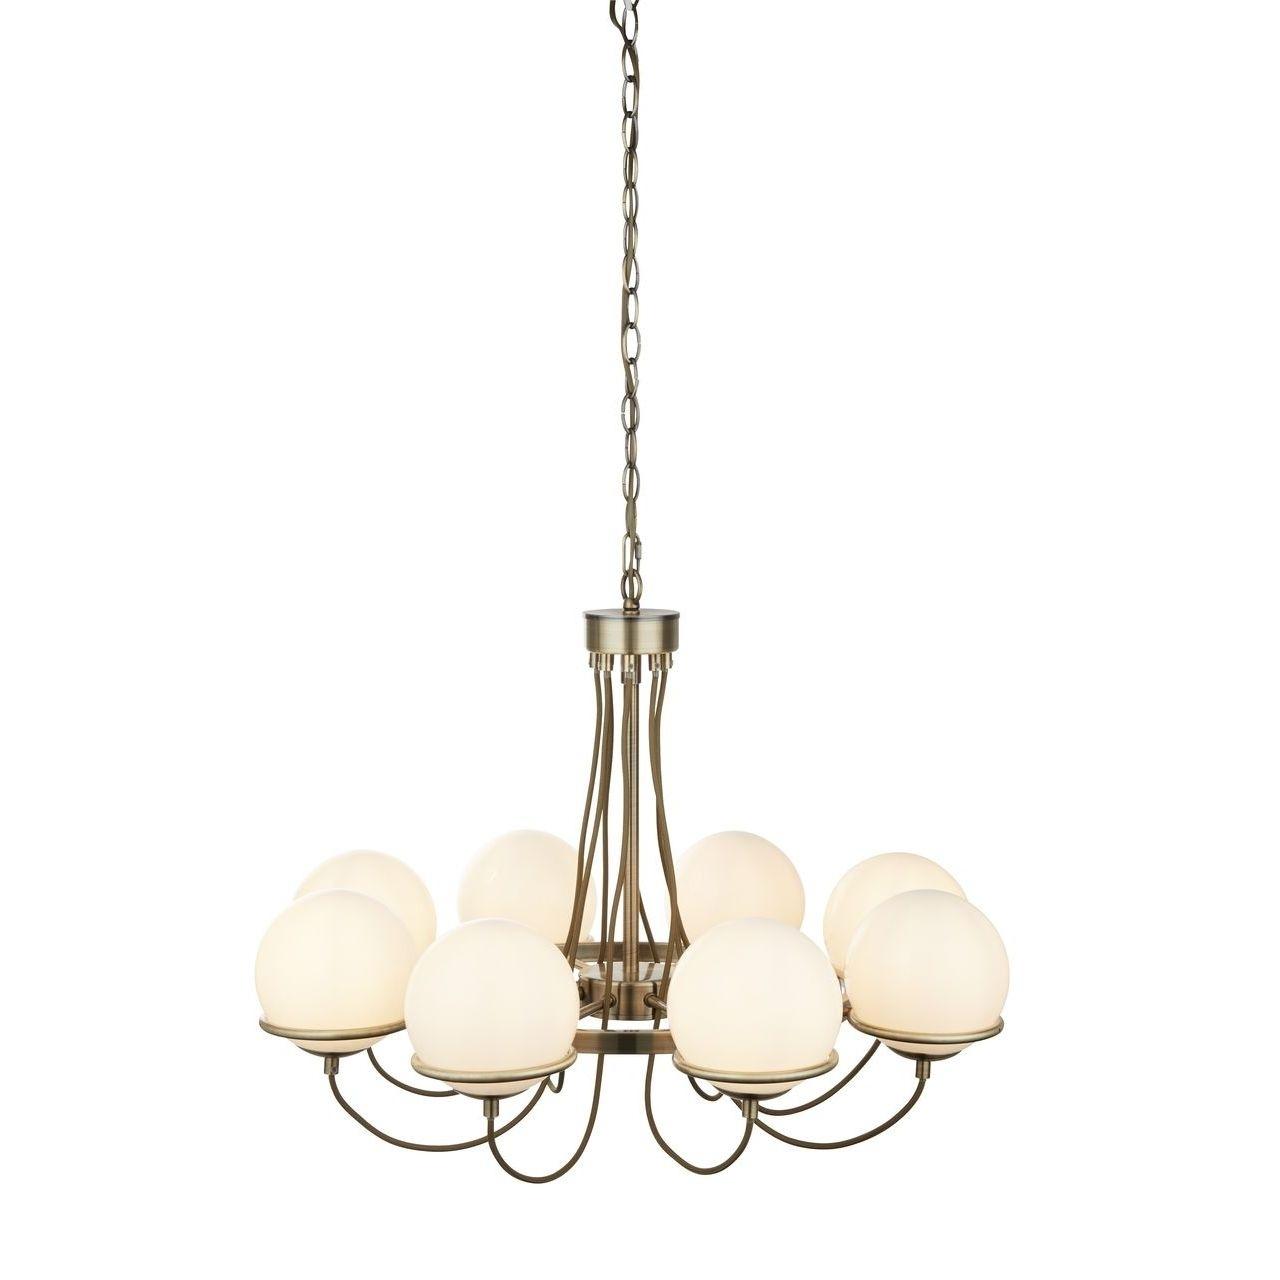 A2990LM-8AB Подвесная люстра Arte Lamp Bergamo